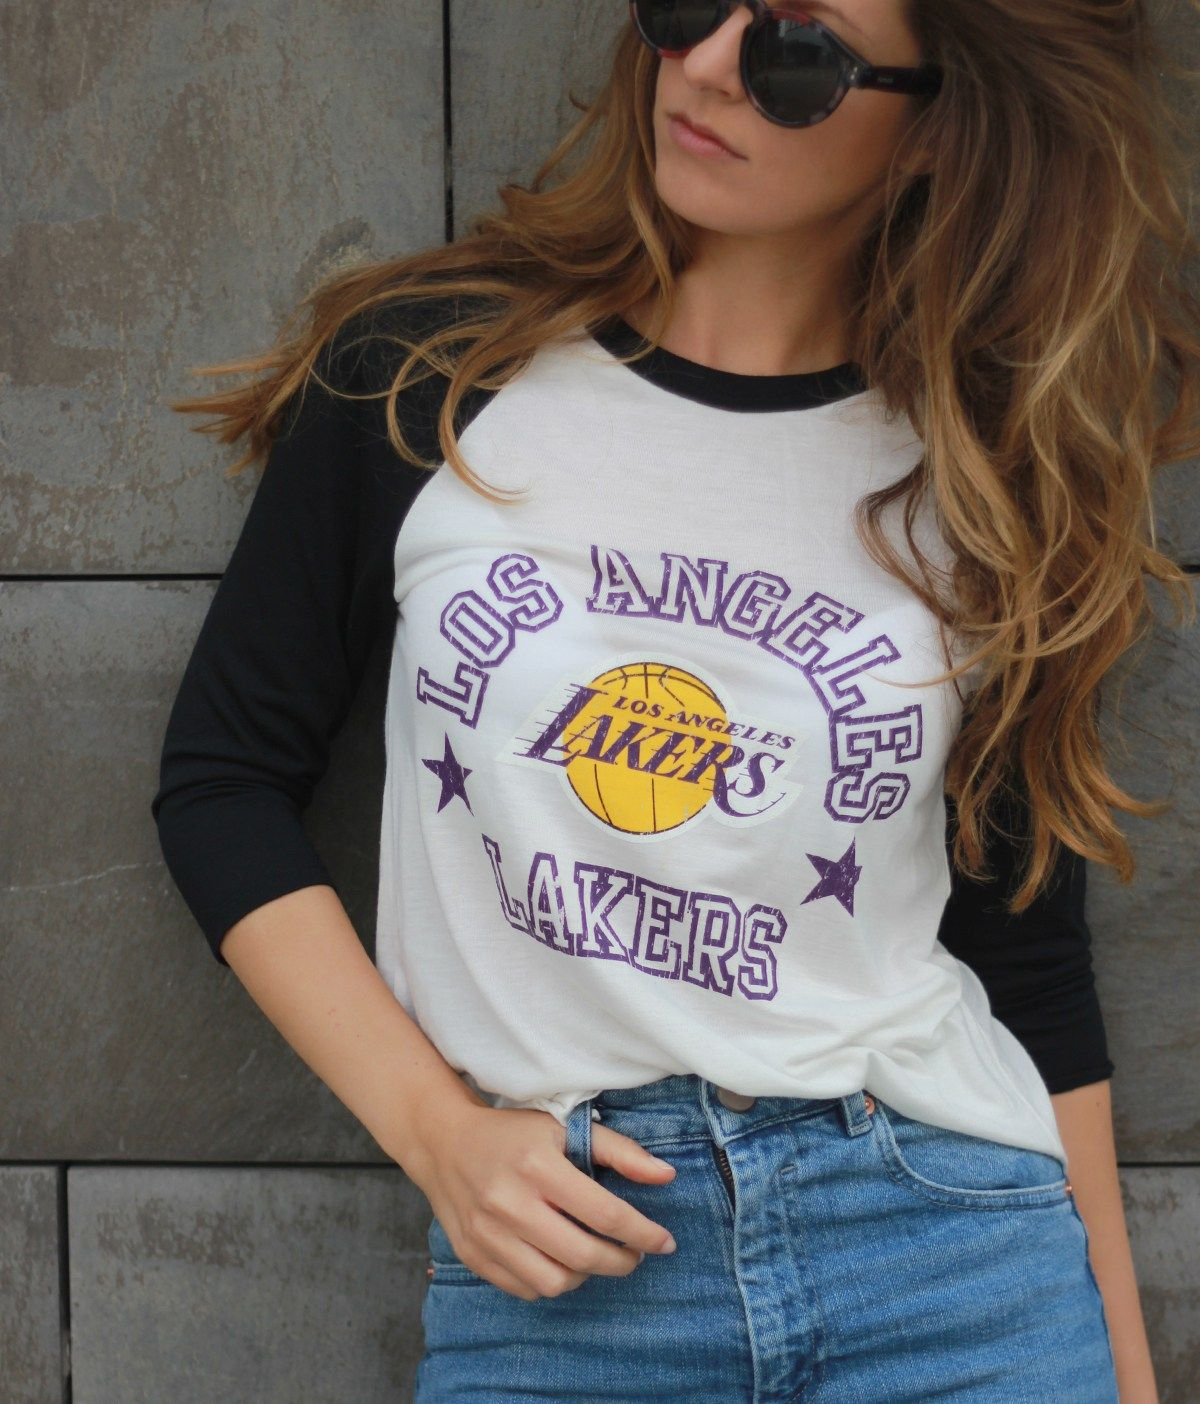 California Girl At Heart Lakers outfit, Lakers shirt